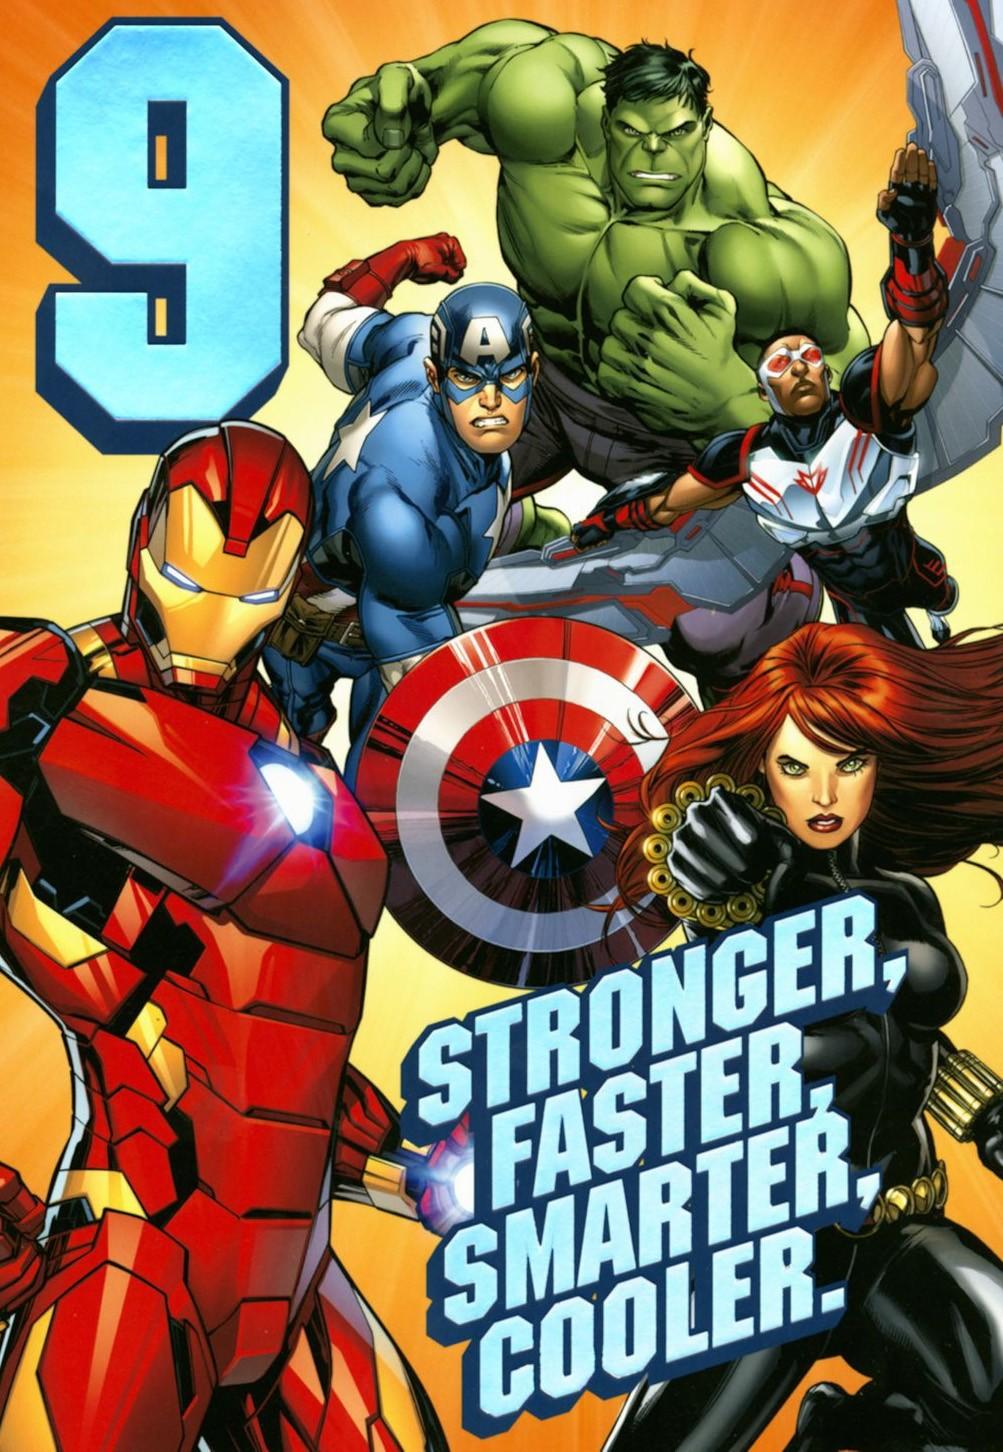 A Marvel birthday card from Hallmark.